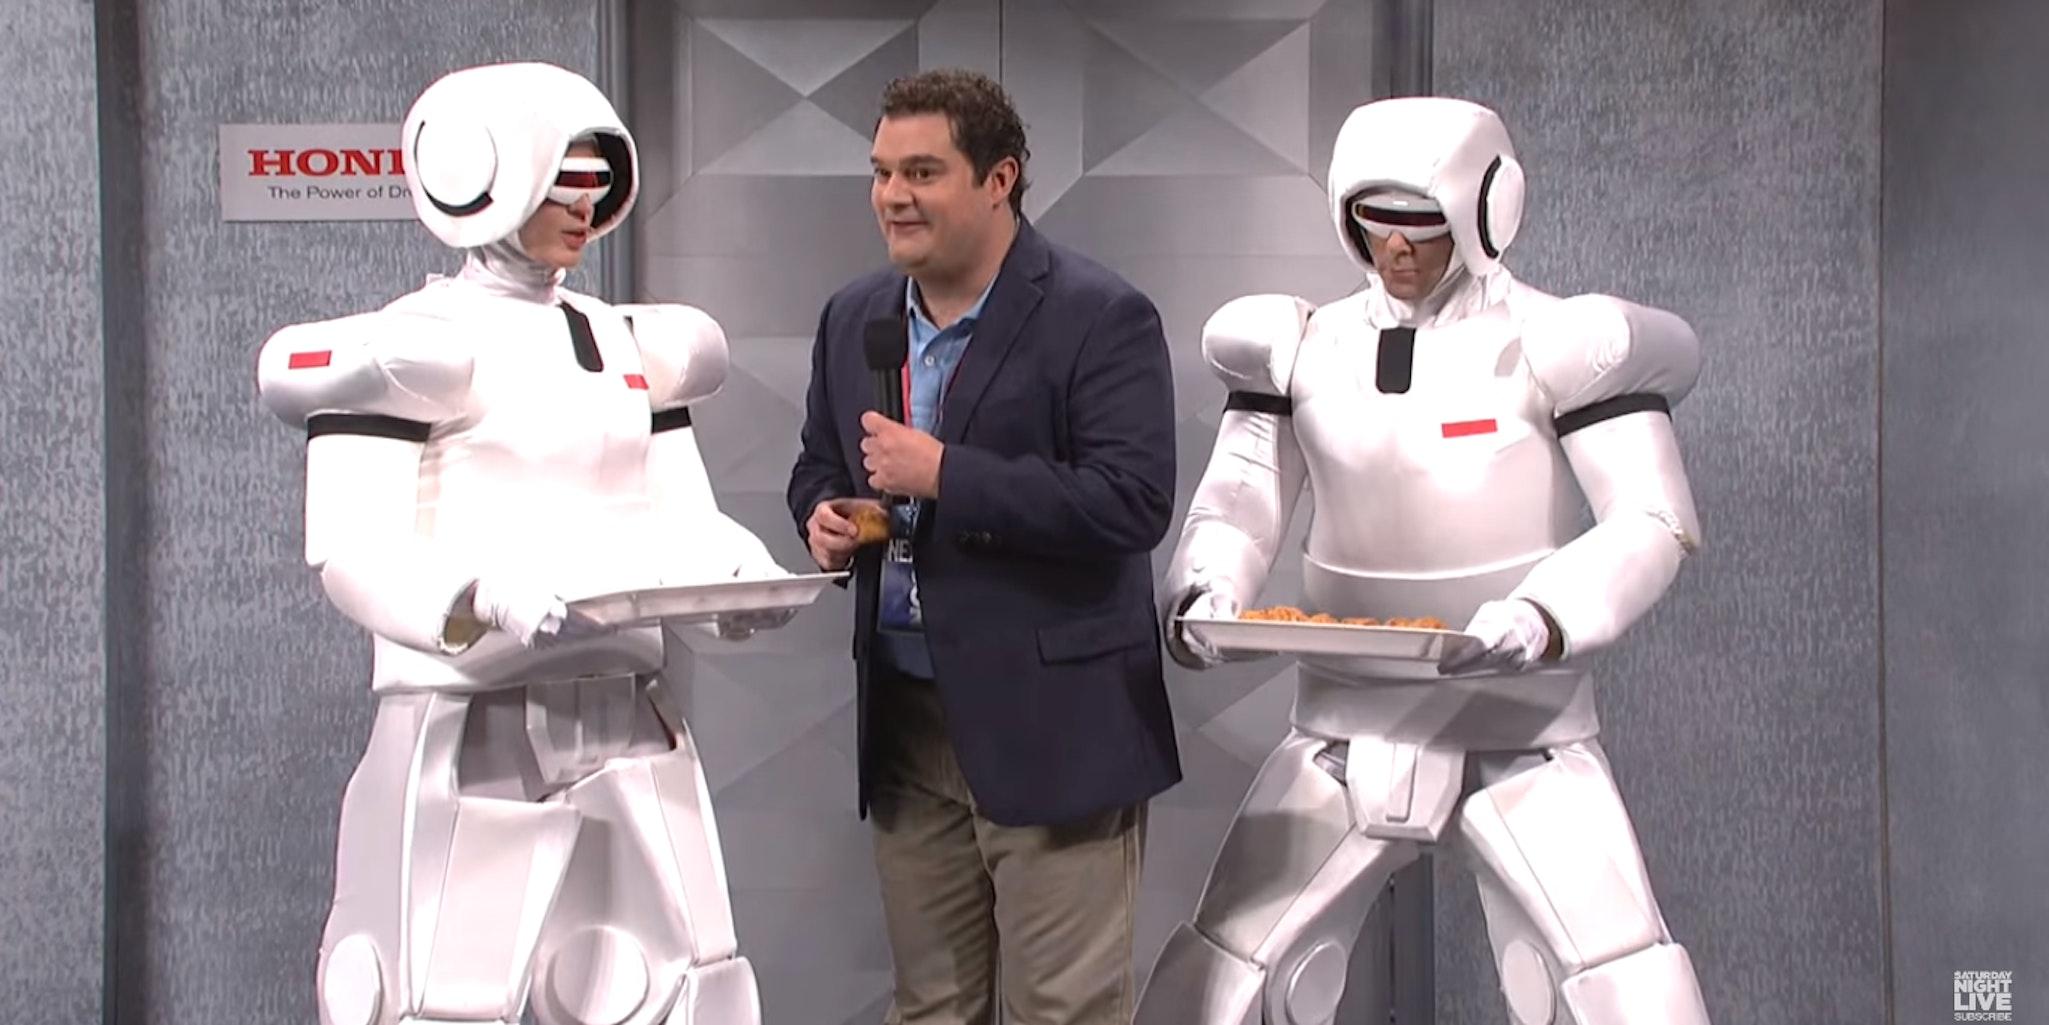 Humanoid robots malfunction on this week's SNL.